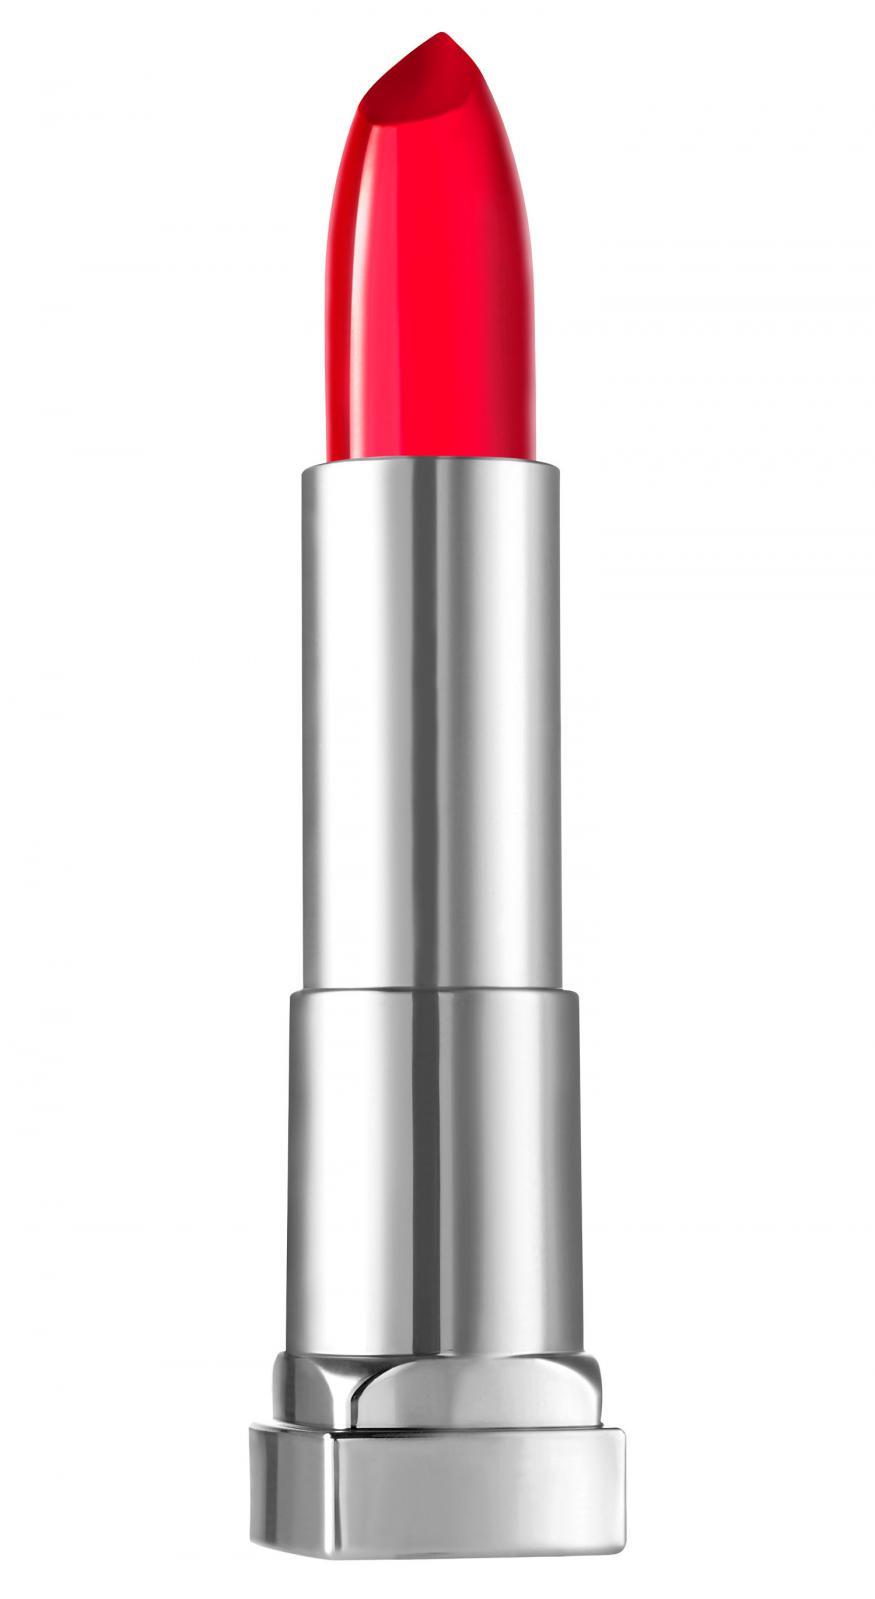 Ruj Maybelline Colorsensational Popsticks - 080 Ch